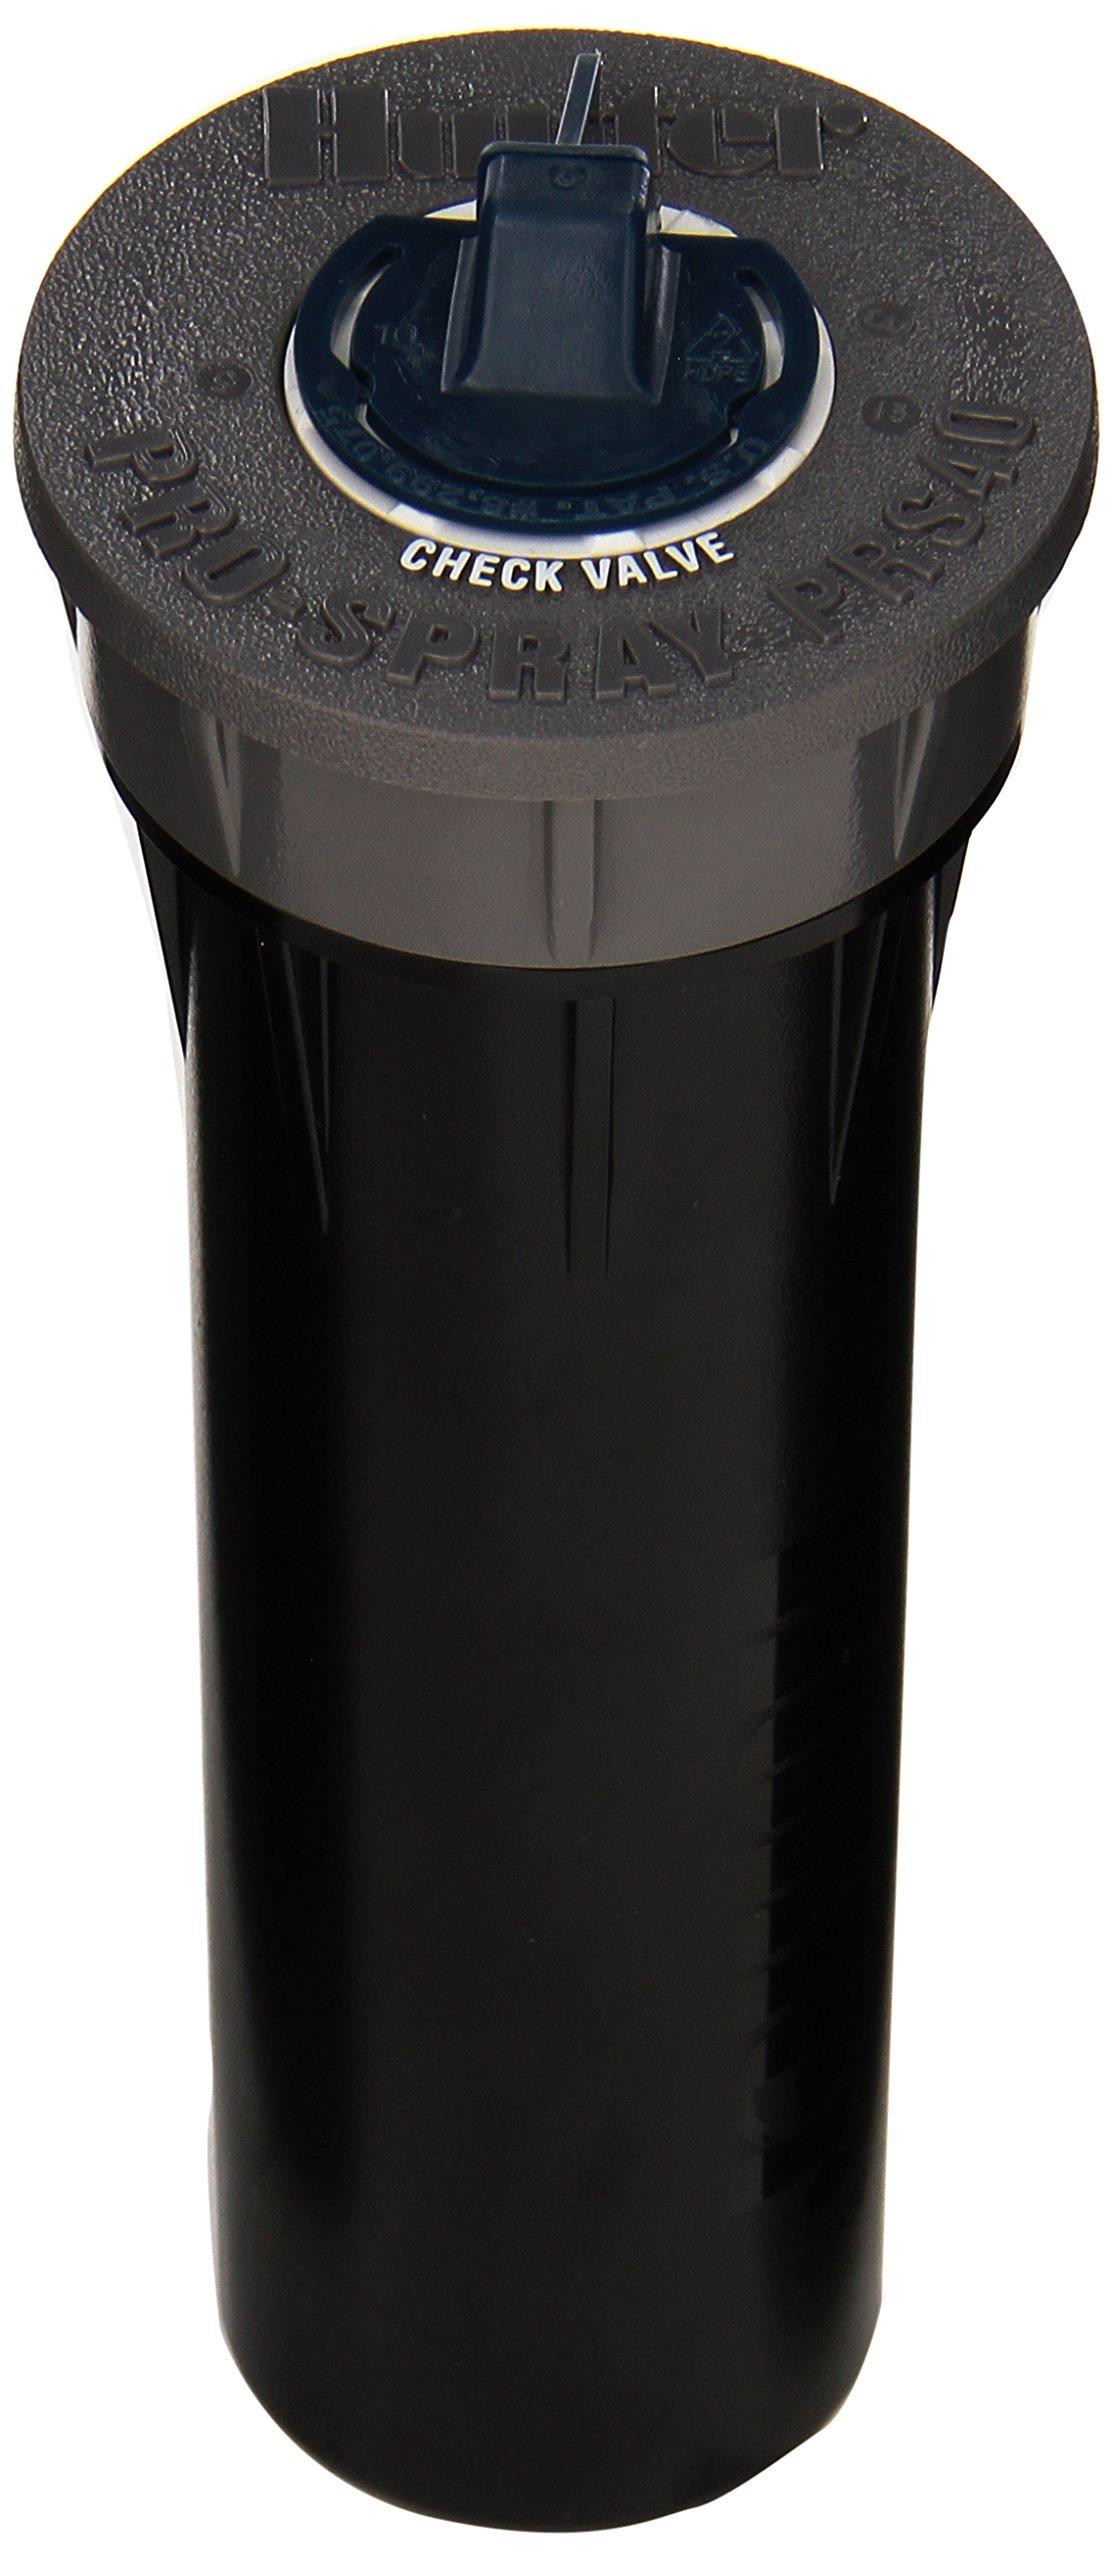 Hunter Sprinkler PROS04PRS40CV Pro-Spray 4-Inch Pop-Up Sprinkler Regulated at 40 PSI with Drain Check Valve